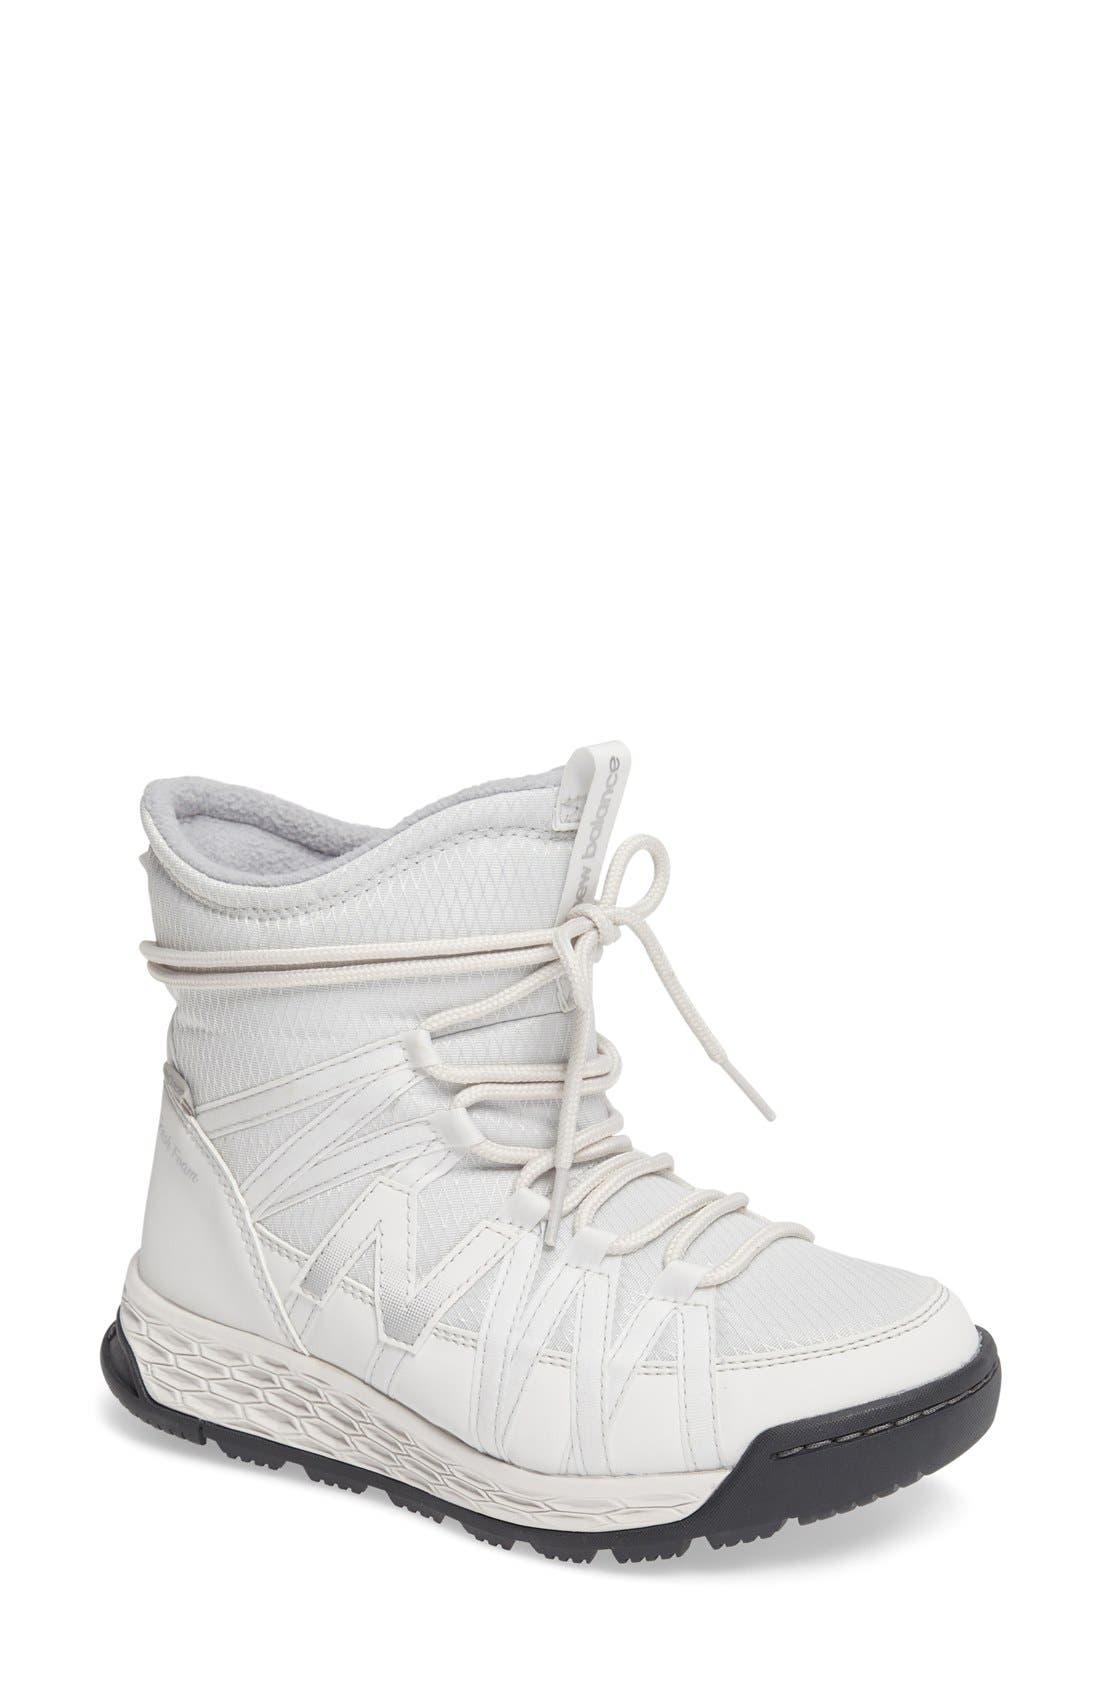 New Balance Q416 Weatherproof Snow Boot (Women)